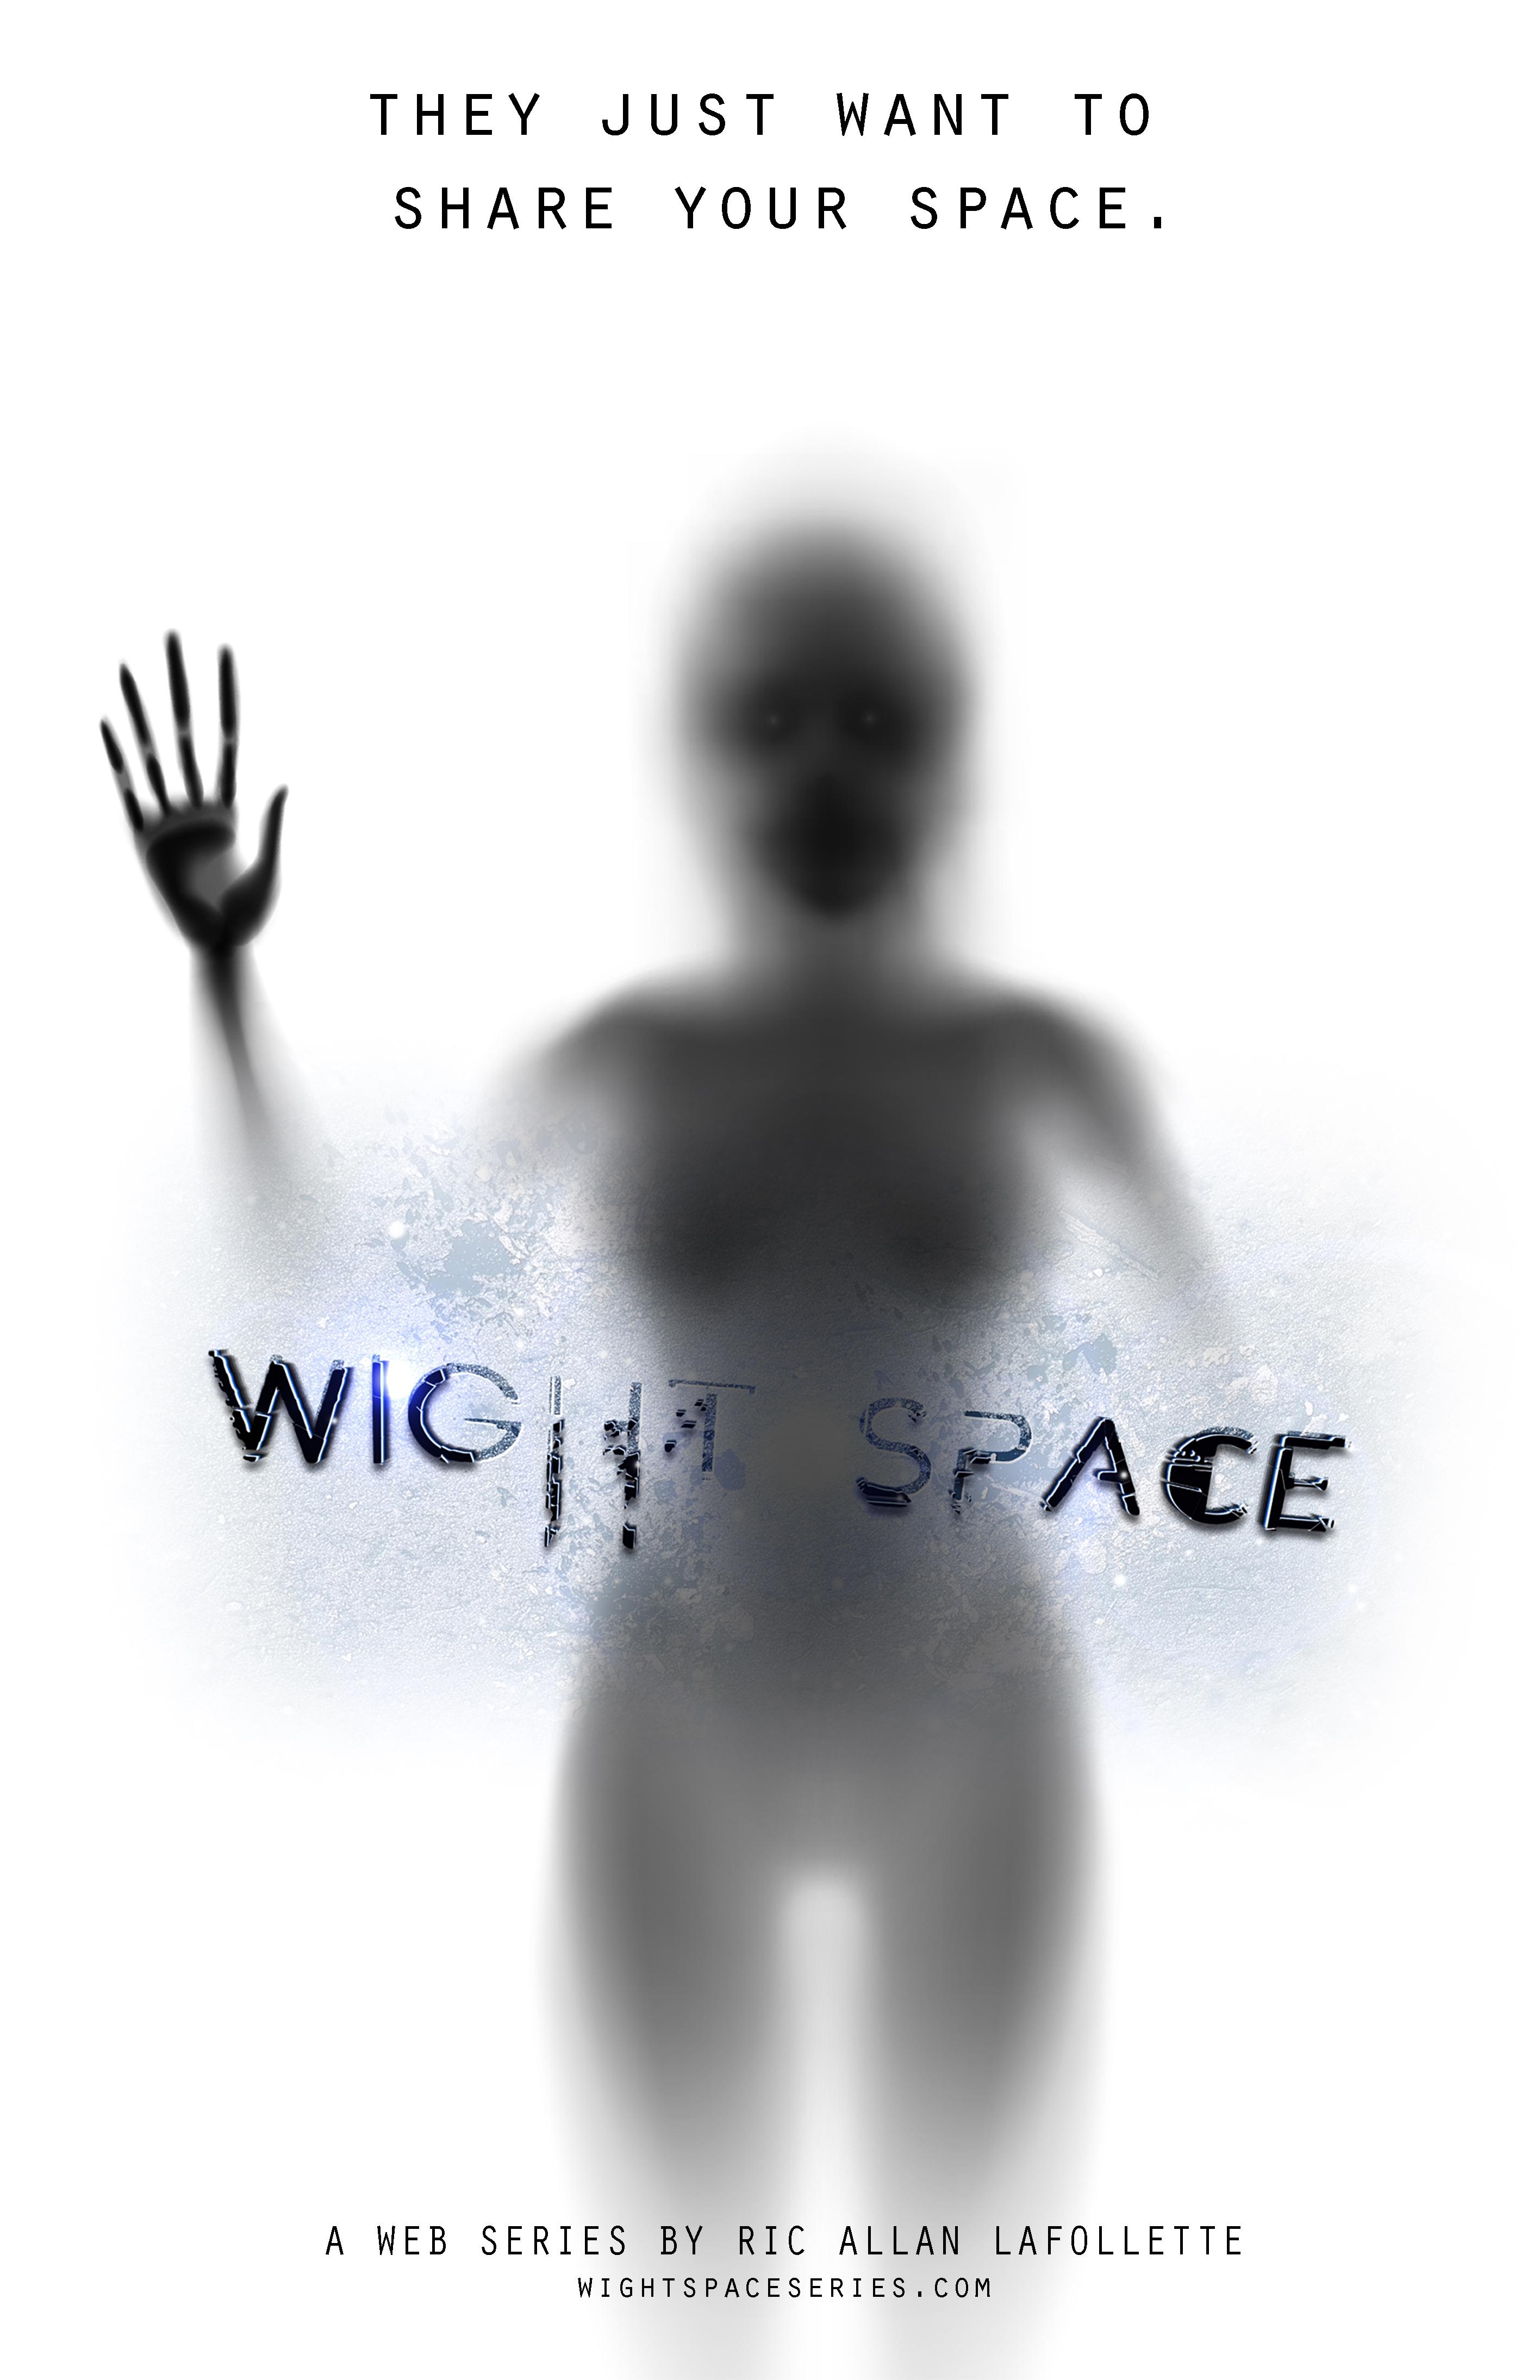 Wight Space (TV Series 2016– ) - IMDb